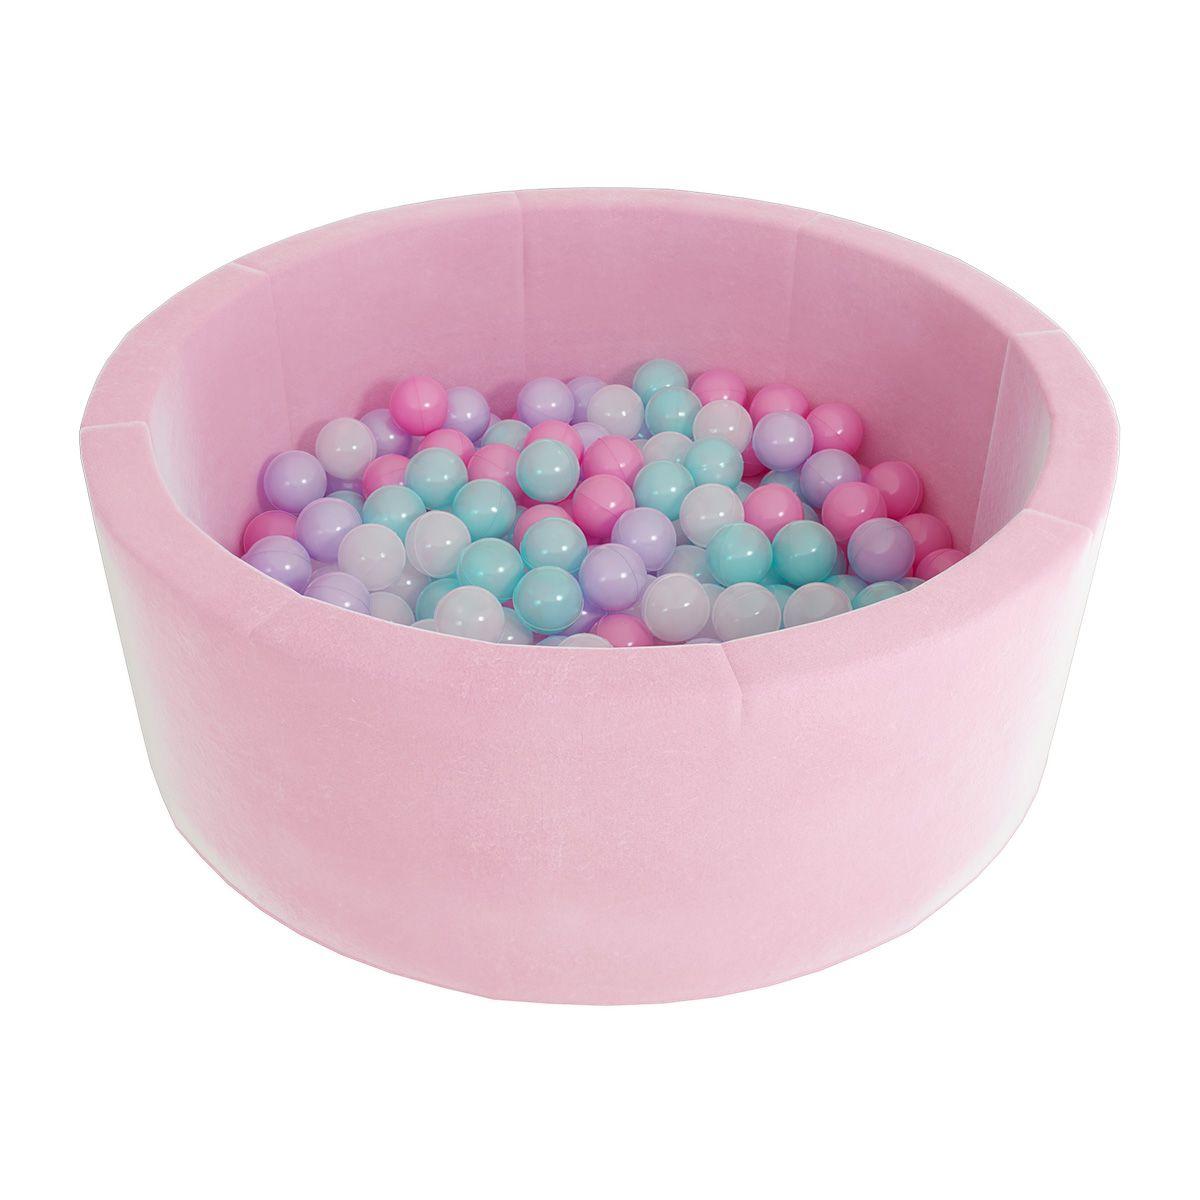 "Romana / Dry pool ""Airpool Max"", pink"